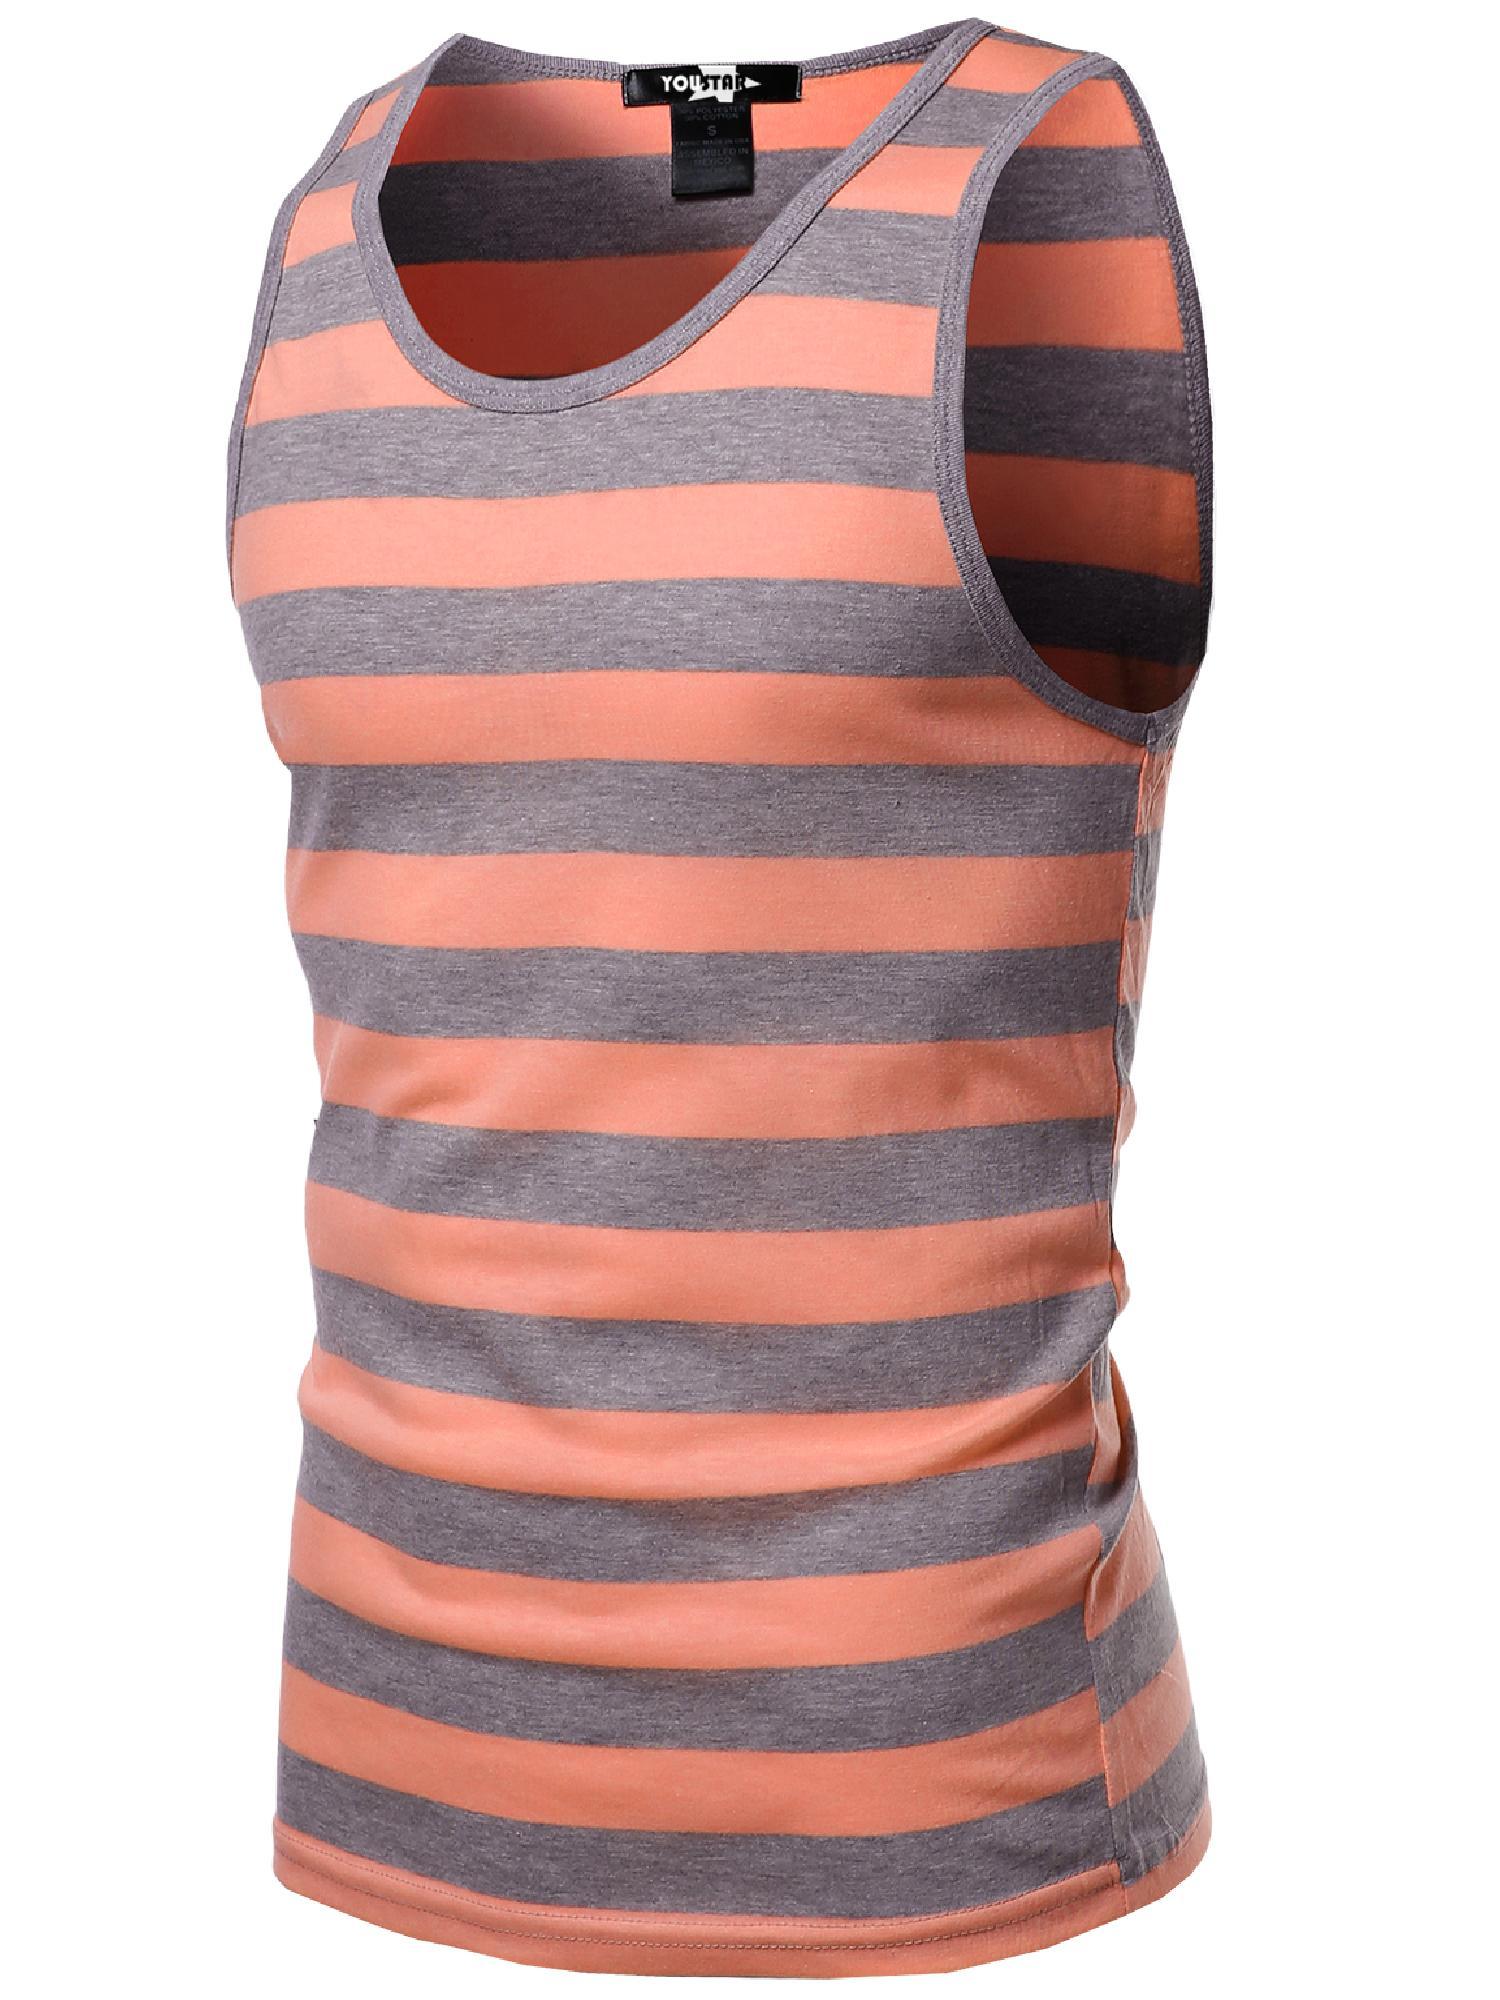 FashionOutfit Men's Basic Round Neck Neon Color Wide Stripe Tank Tops